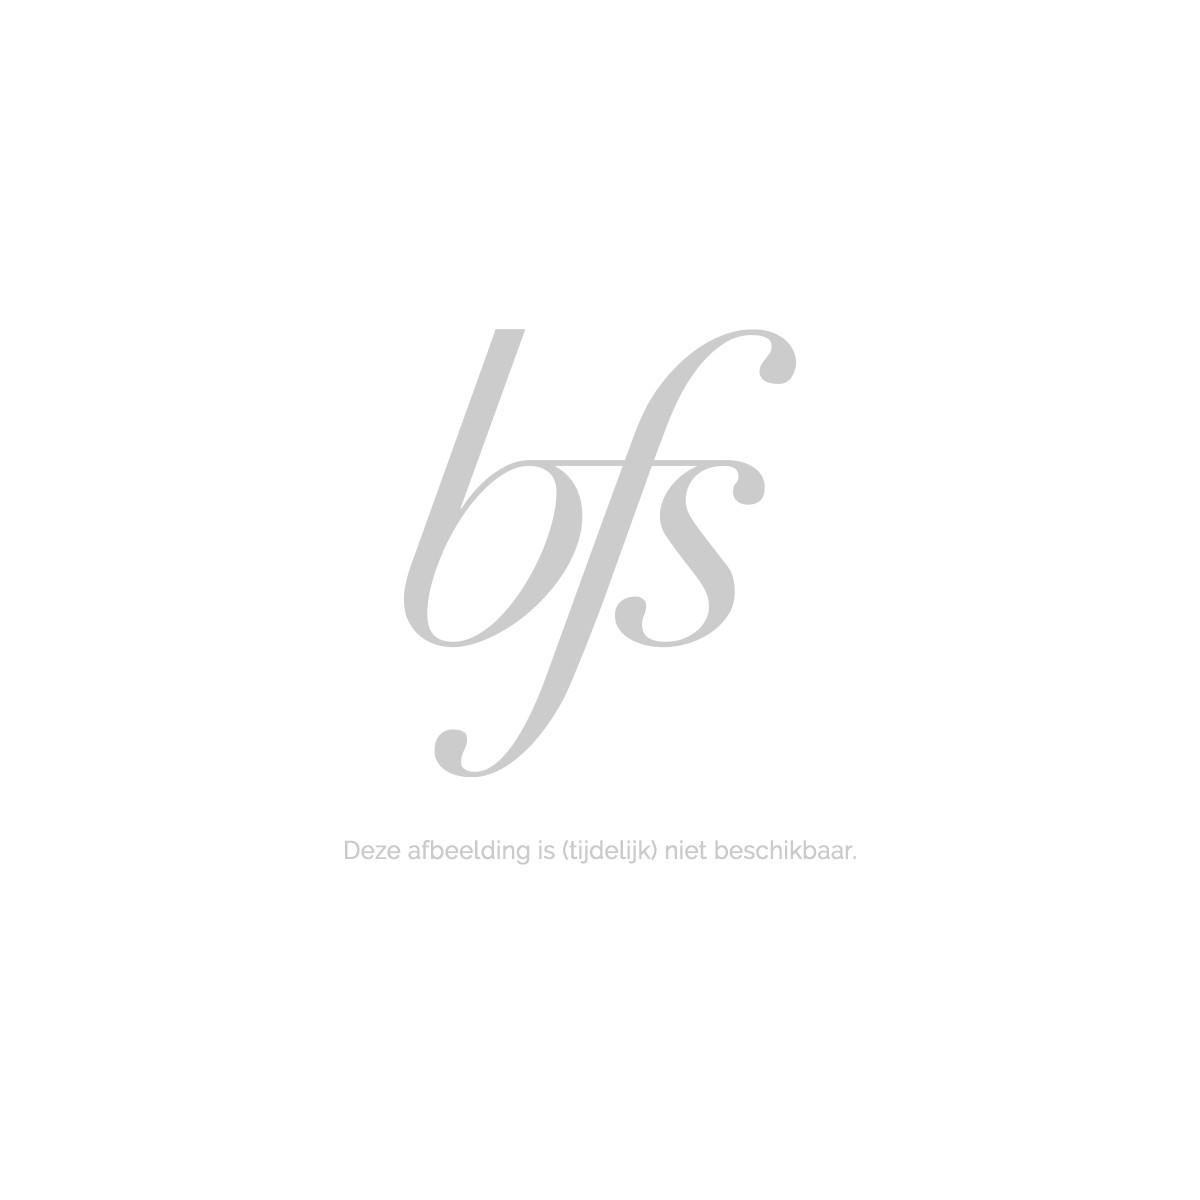 Dibi Milano Collagen And Elastin Booster Concentrate 30Ml S